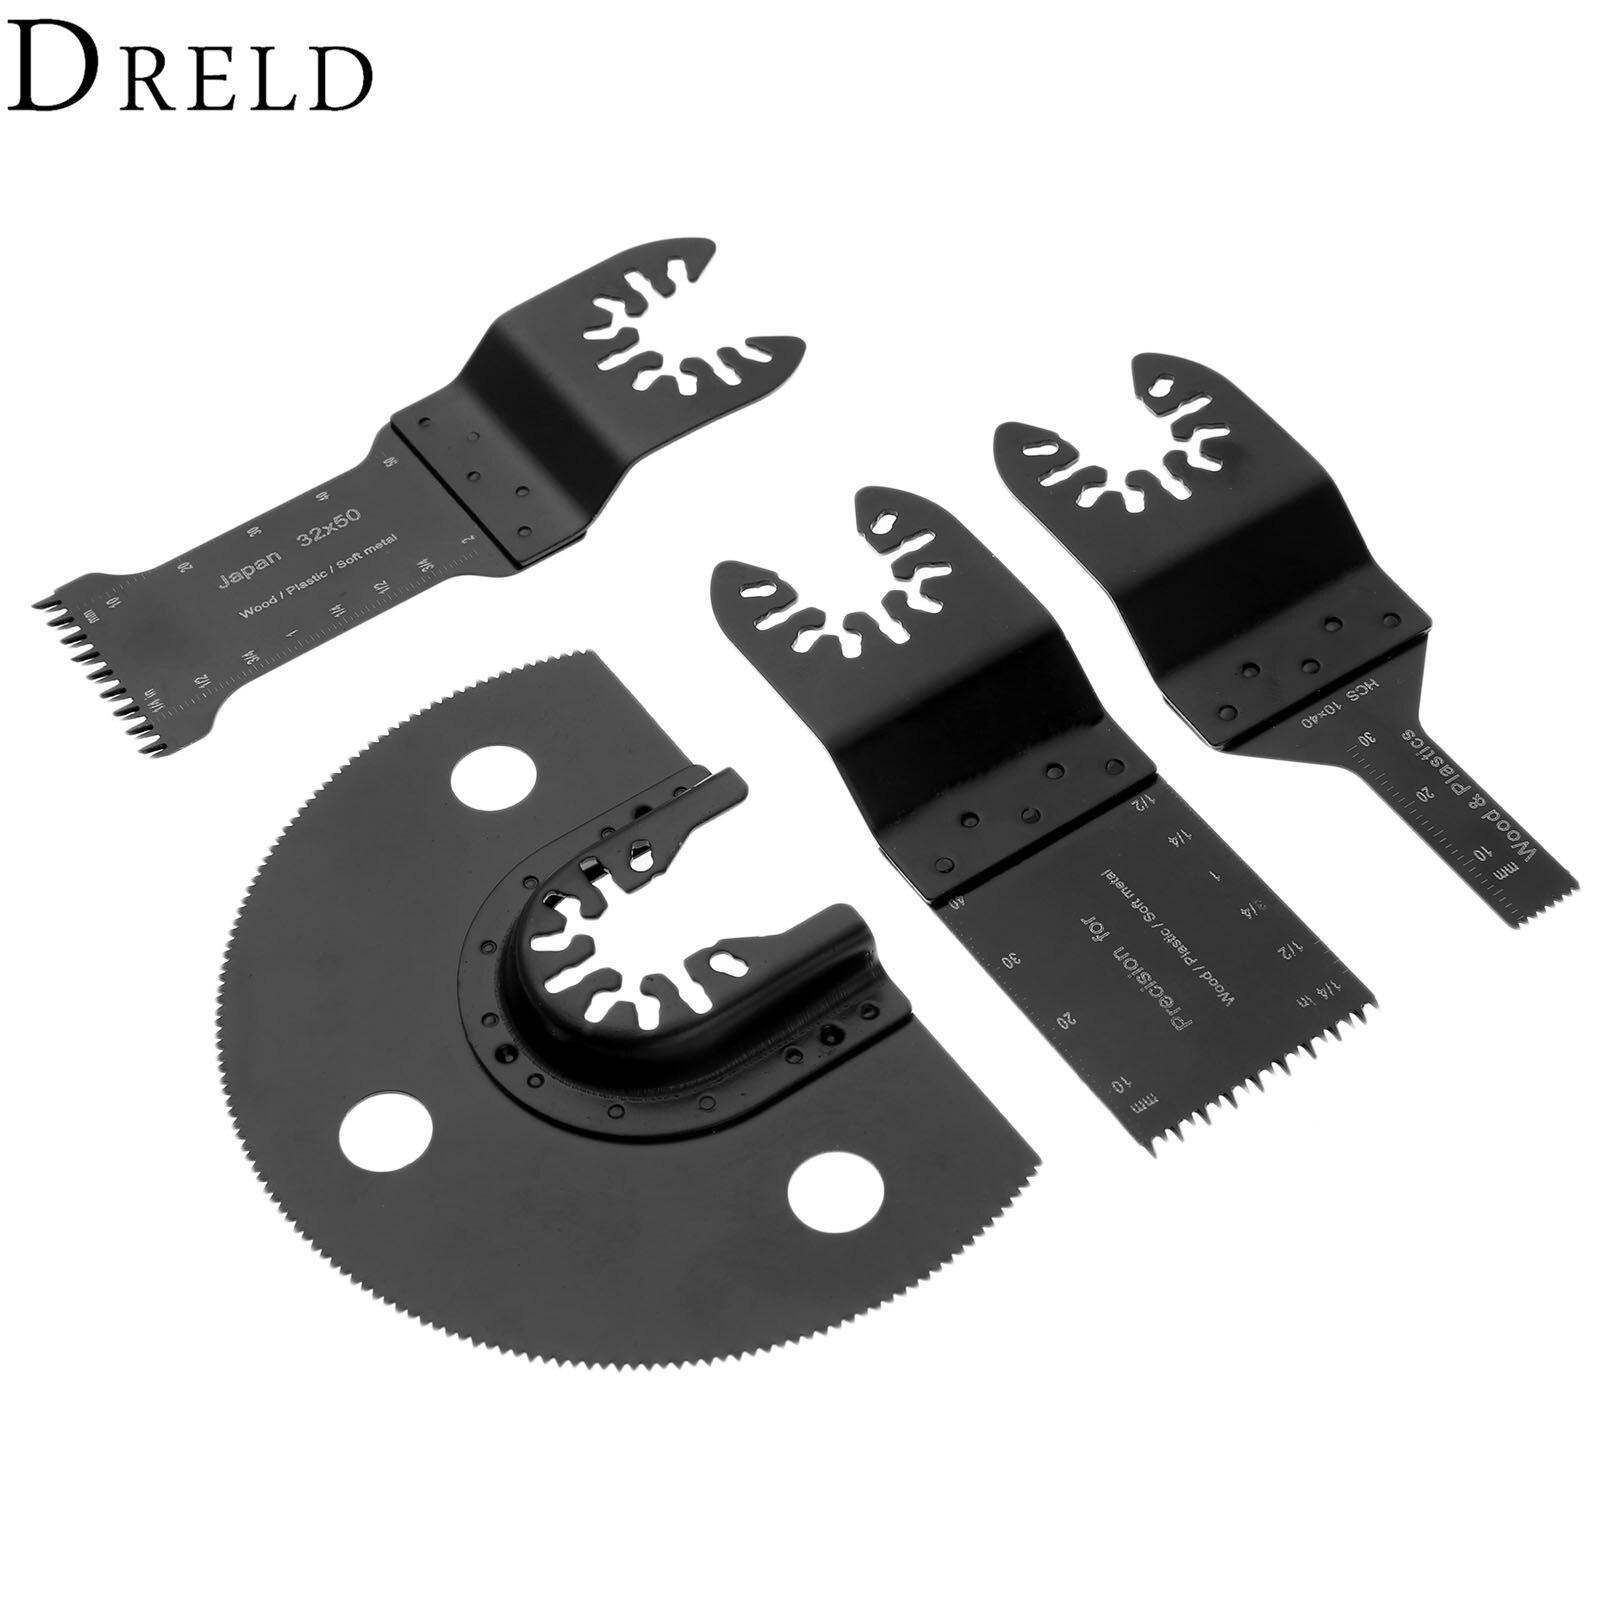 DRELD 4pcs/set Oscillating Multi Tools HCS Saw Blade For Multimaster Fein Dremel Renovator Bosch Power Tool For Metal Cutting